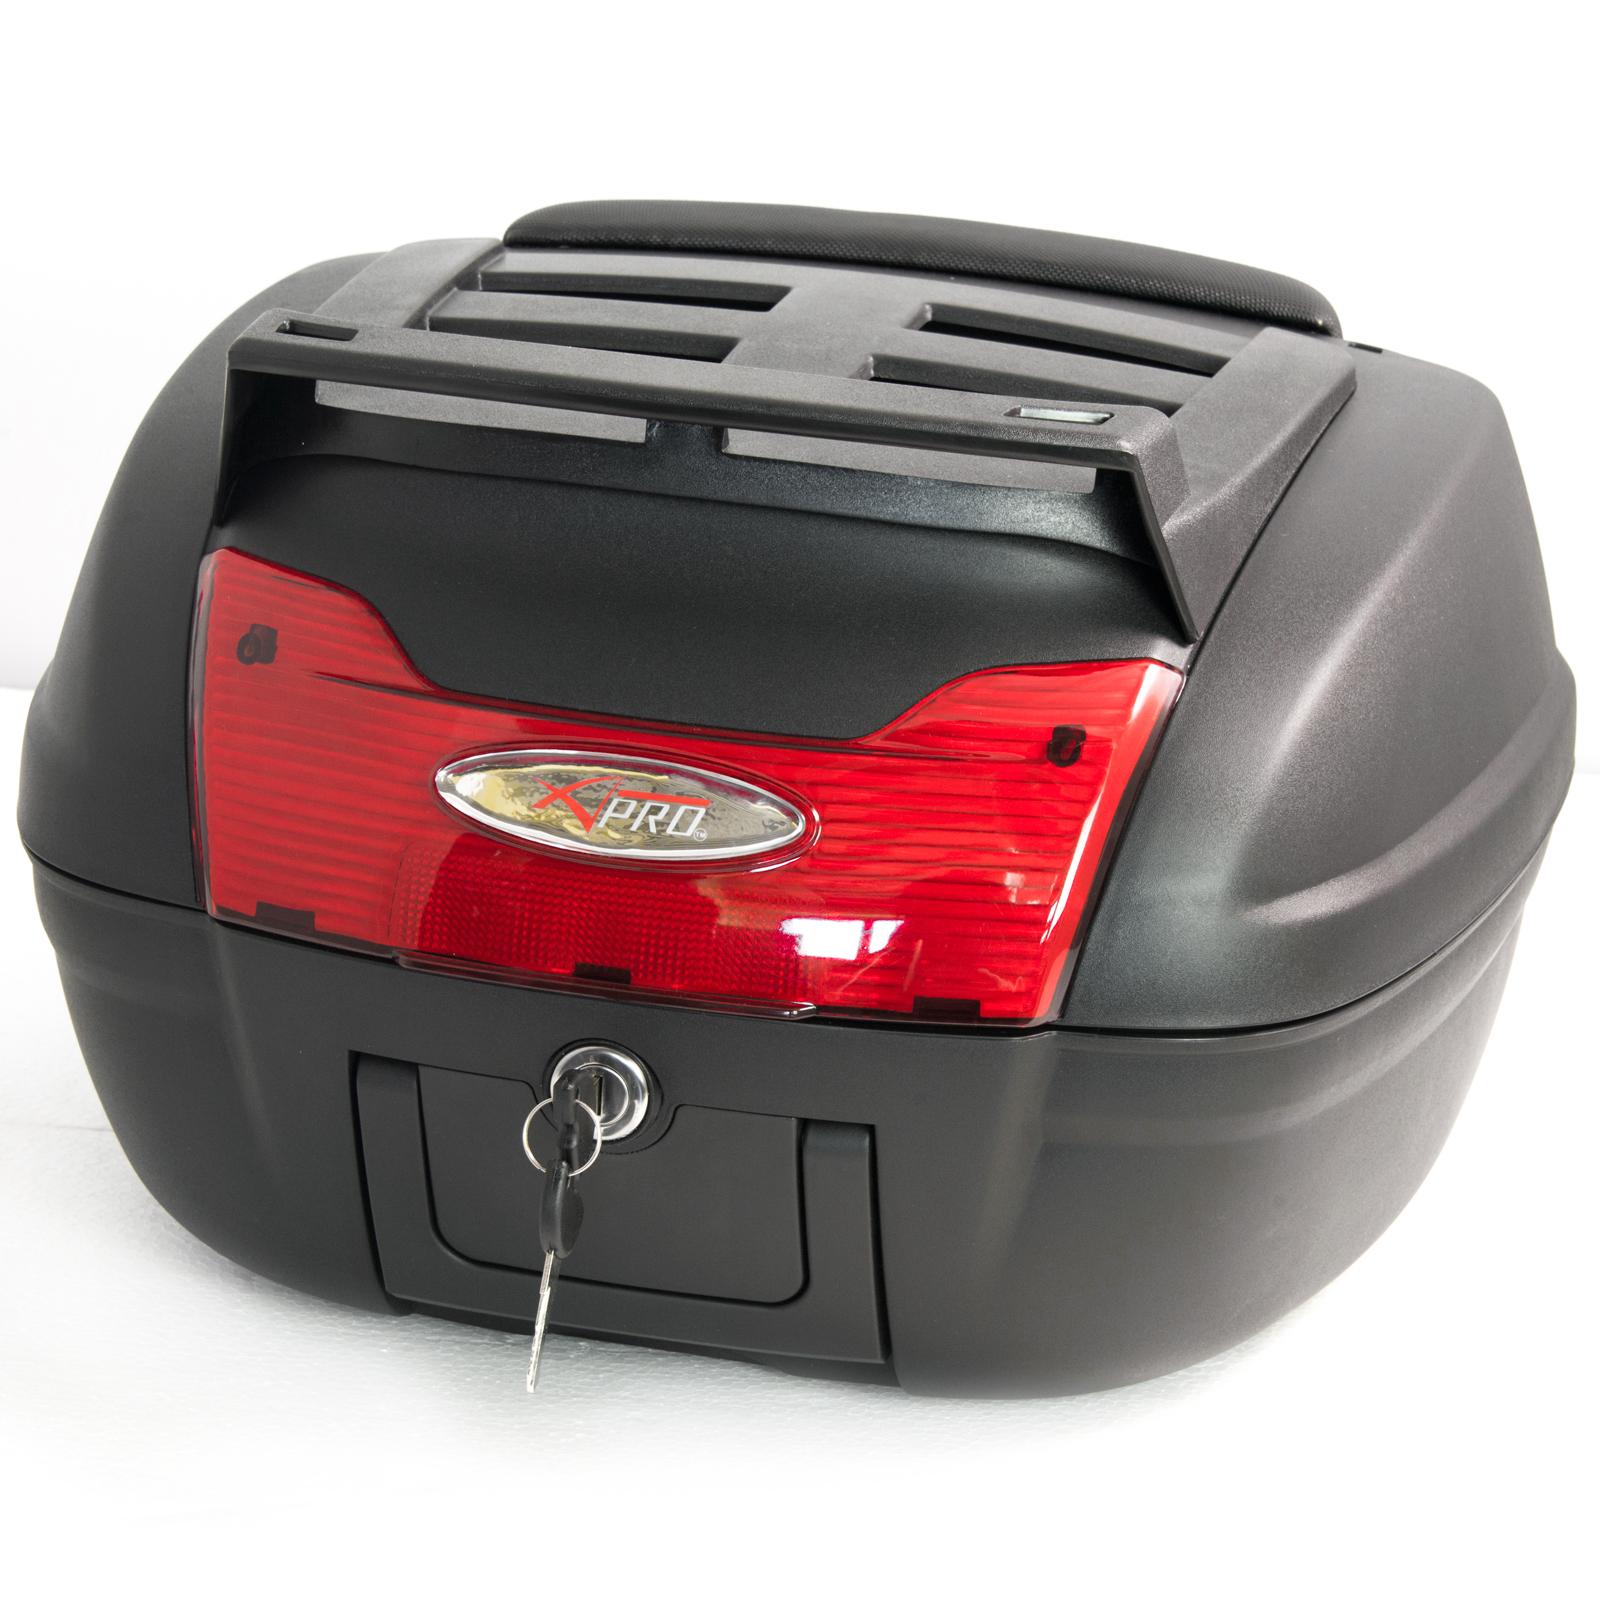 top case box 40 lt universal rack motorcycle motorbike scooter luggage quad ebay. Black Bedroom Furniture Sets. Home Design Ideas